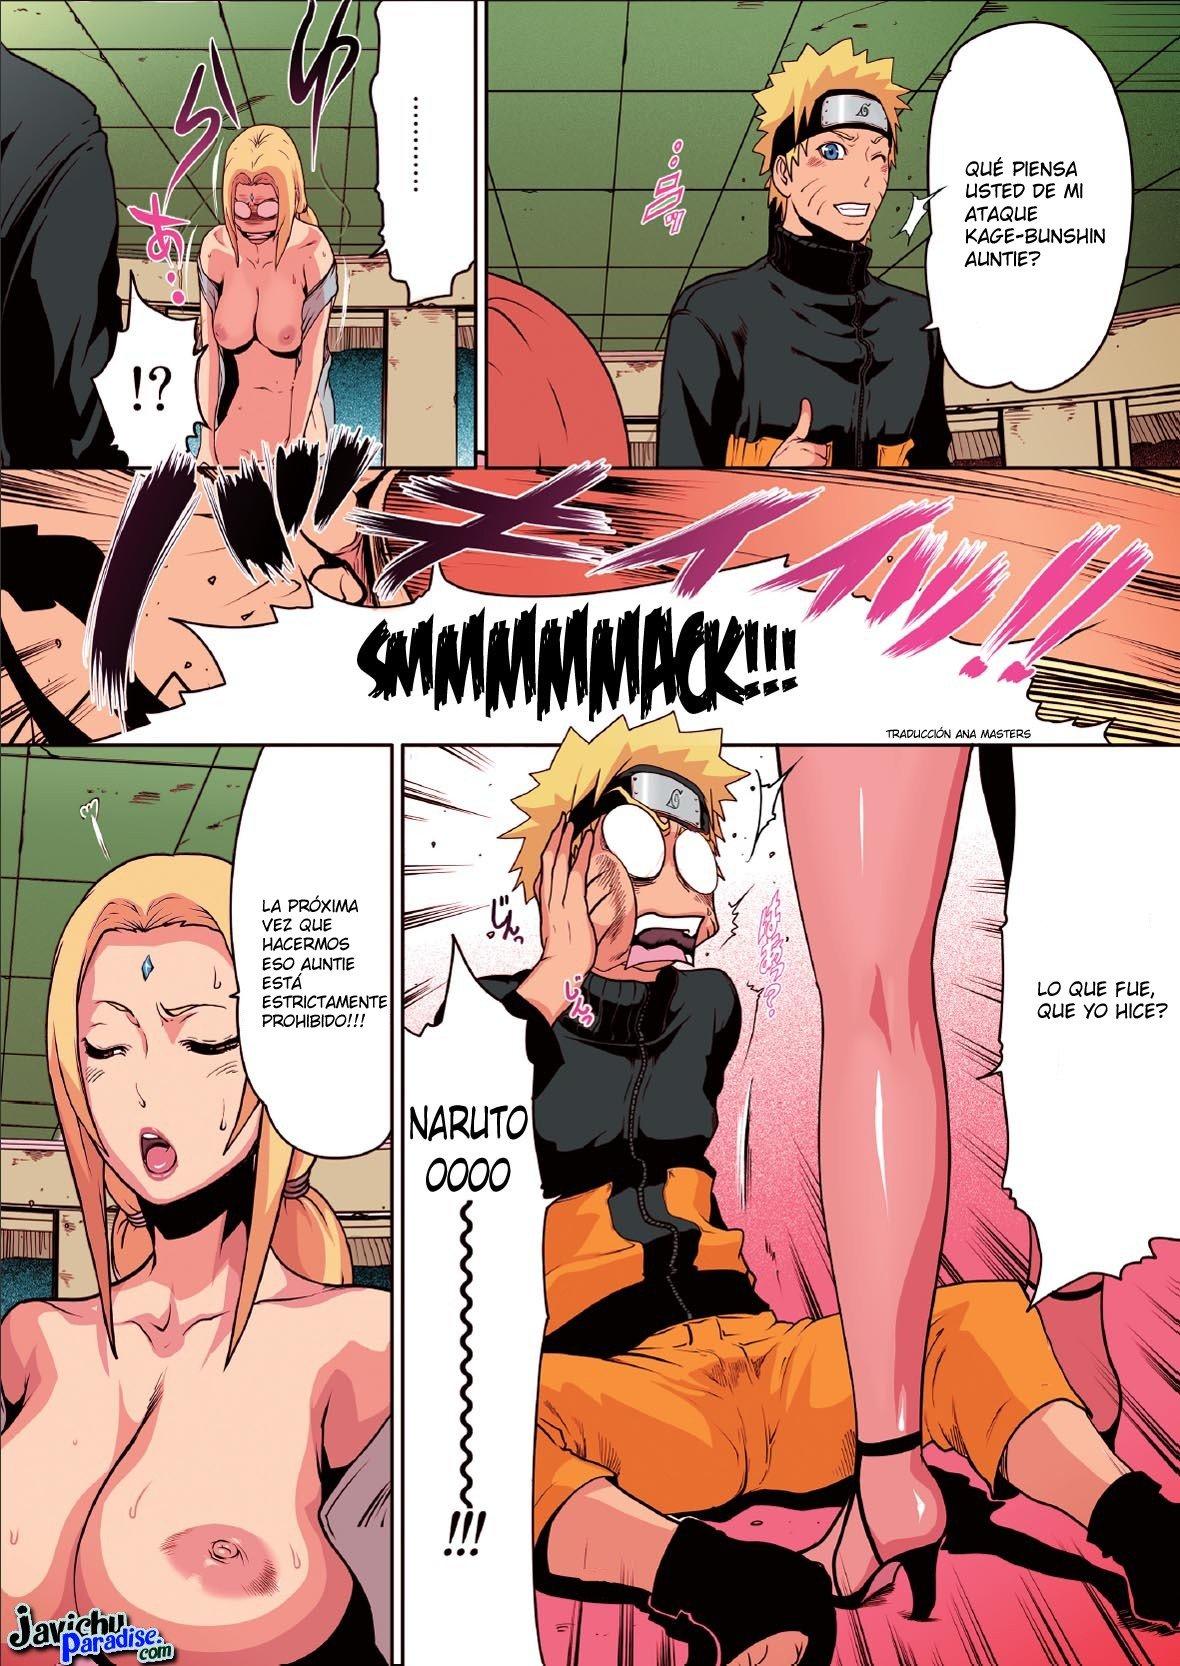 hot babes showing thier vagina